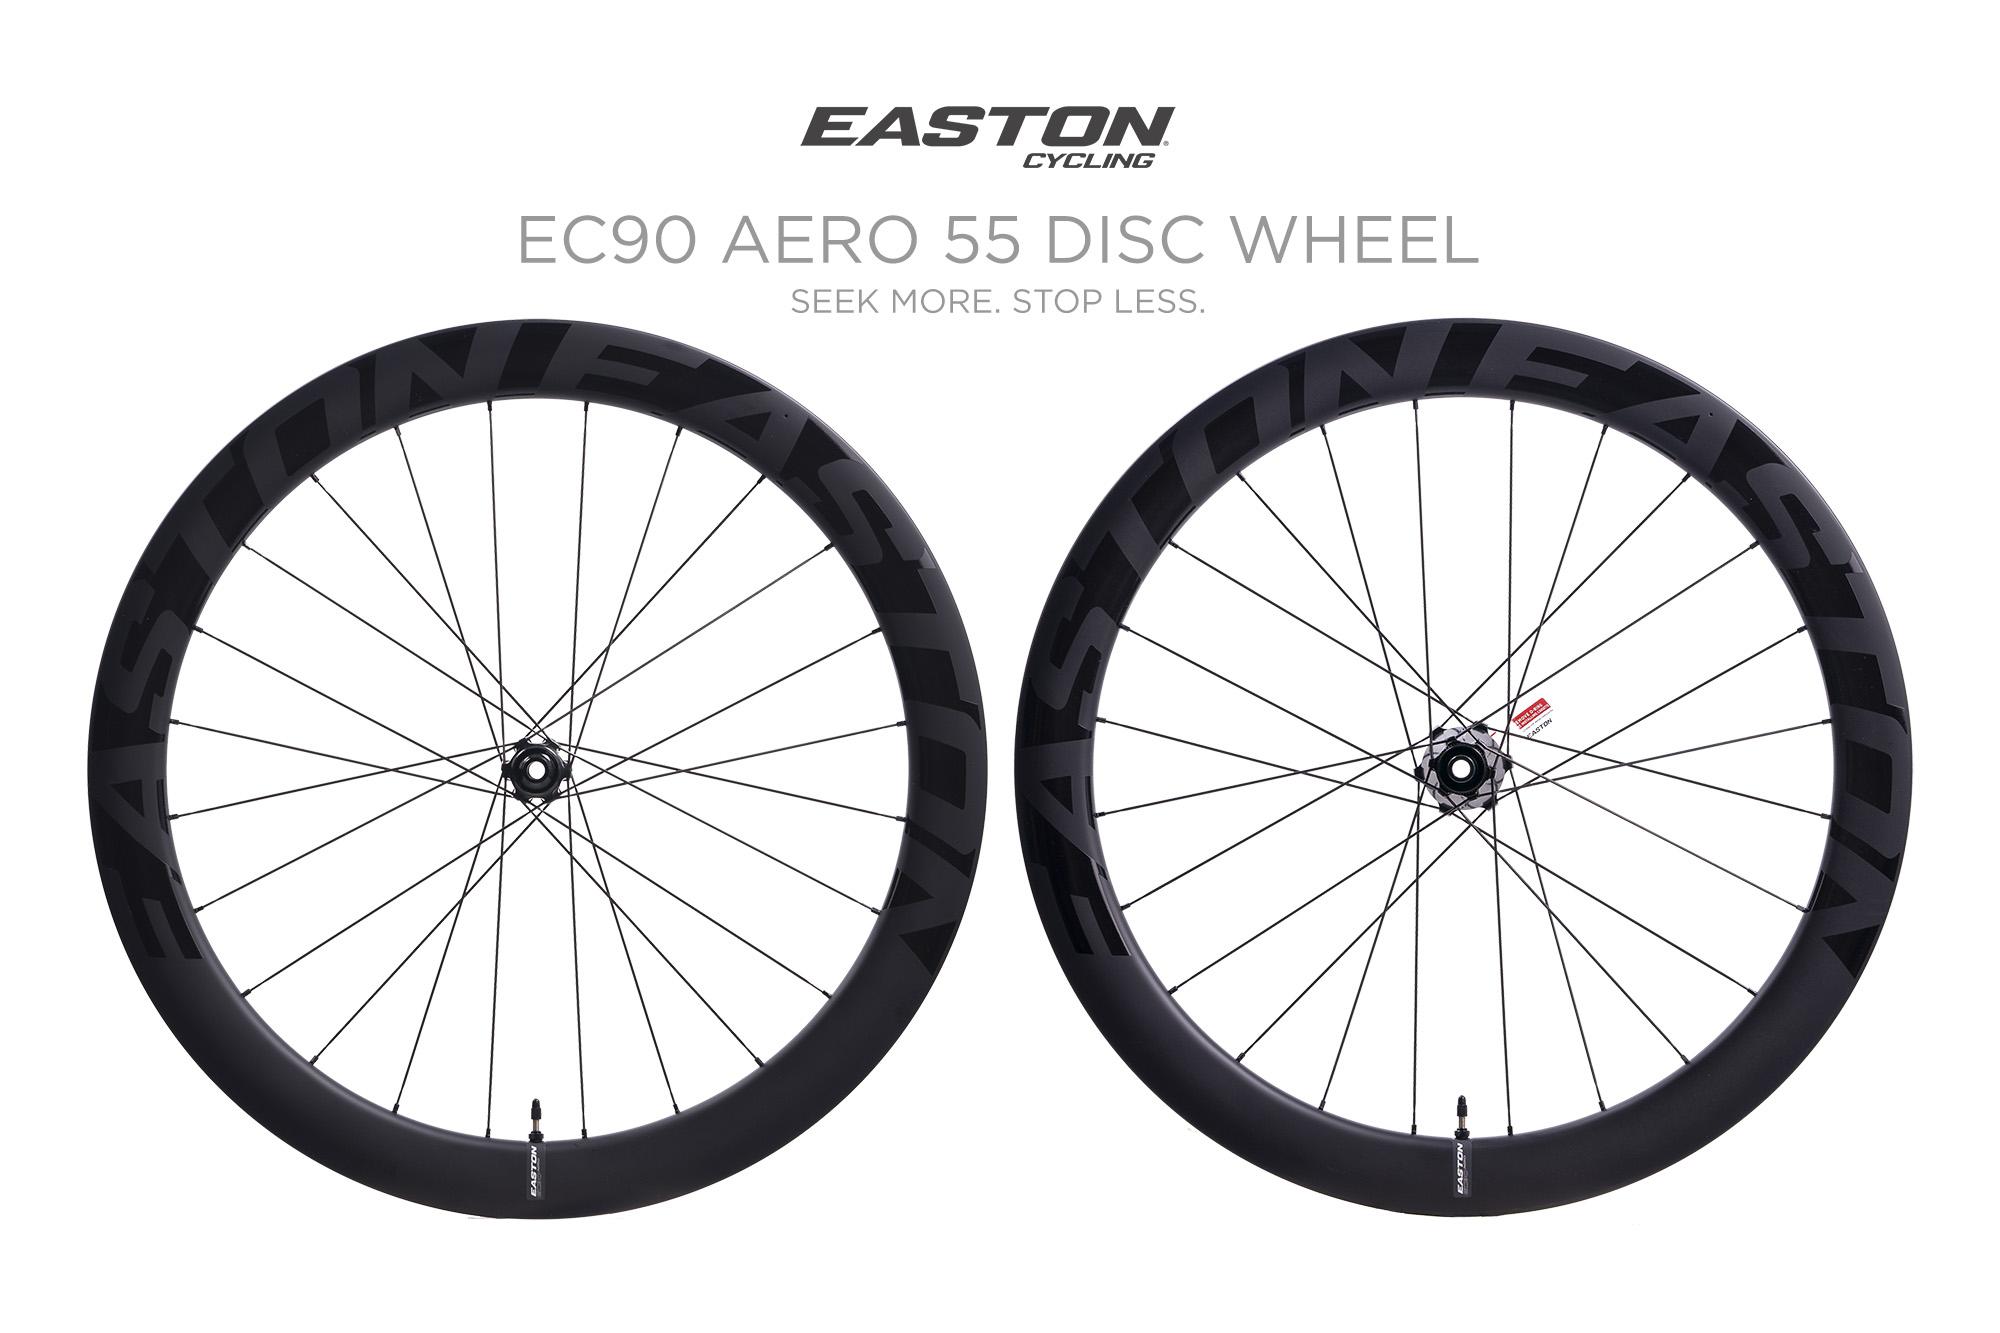 EASTON   EC90 Aero 55 Disc Wheel